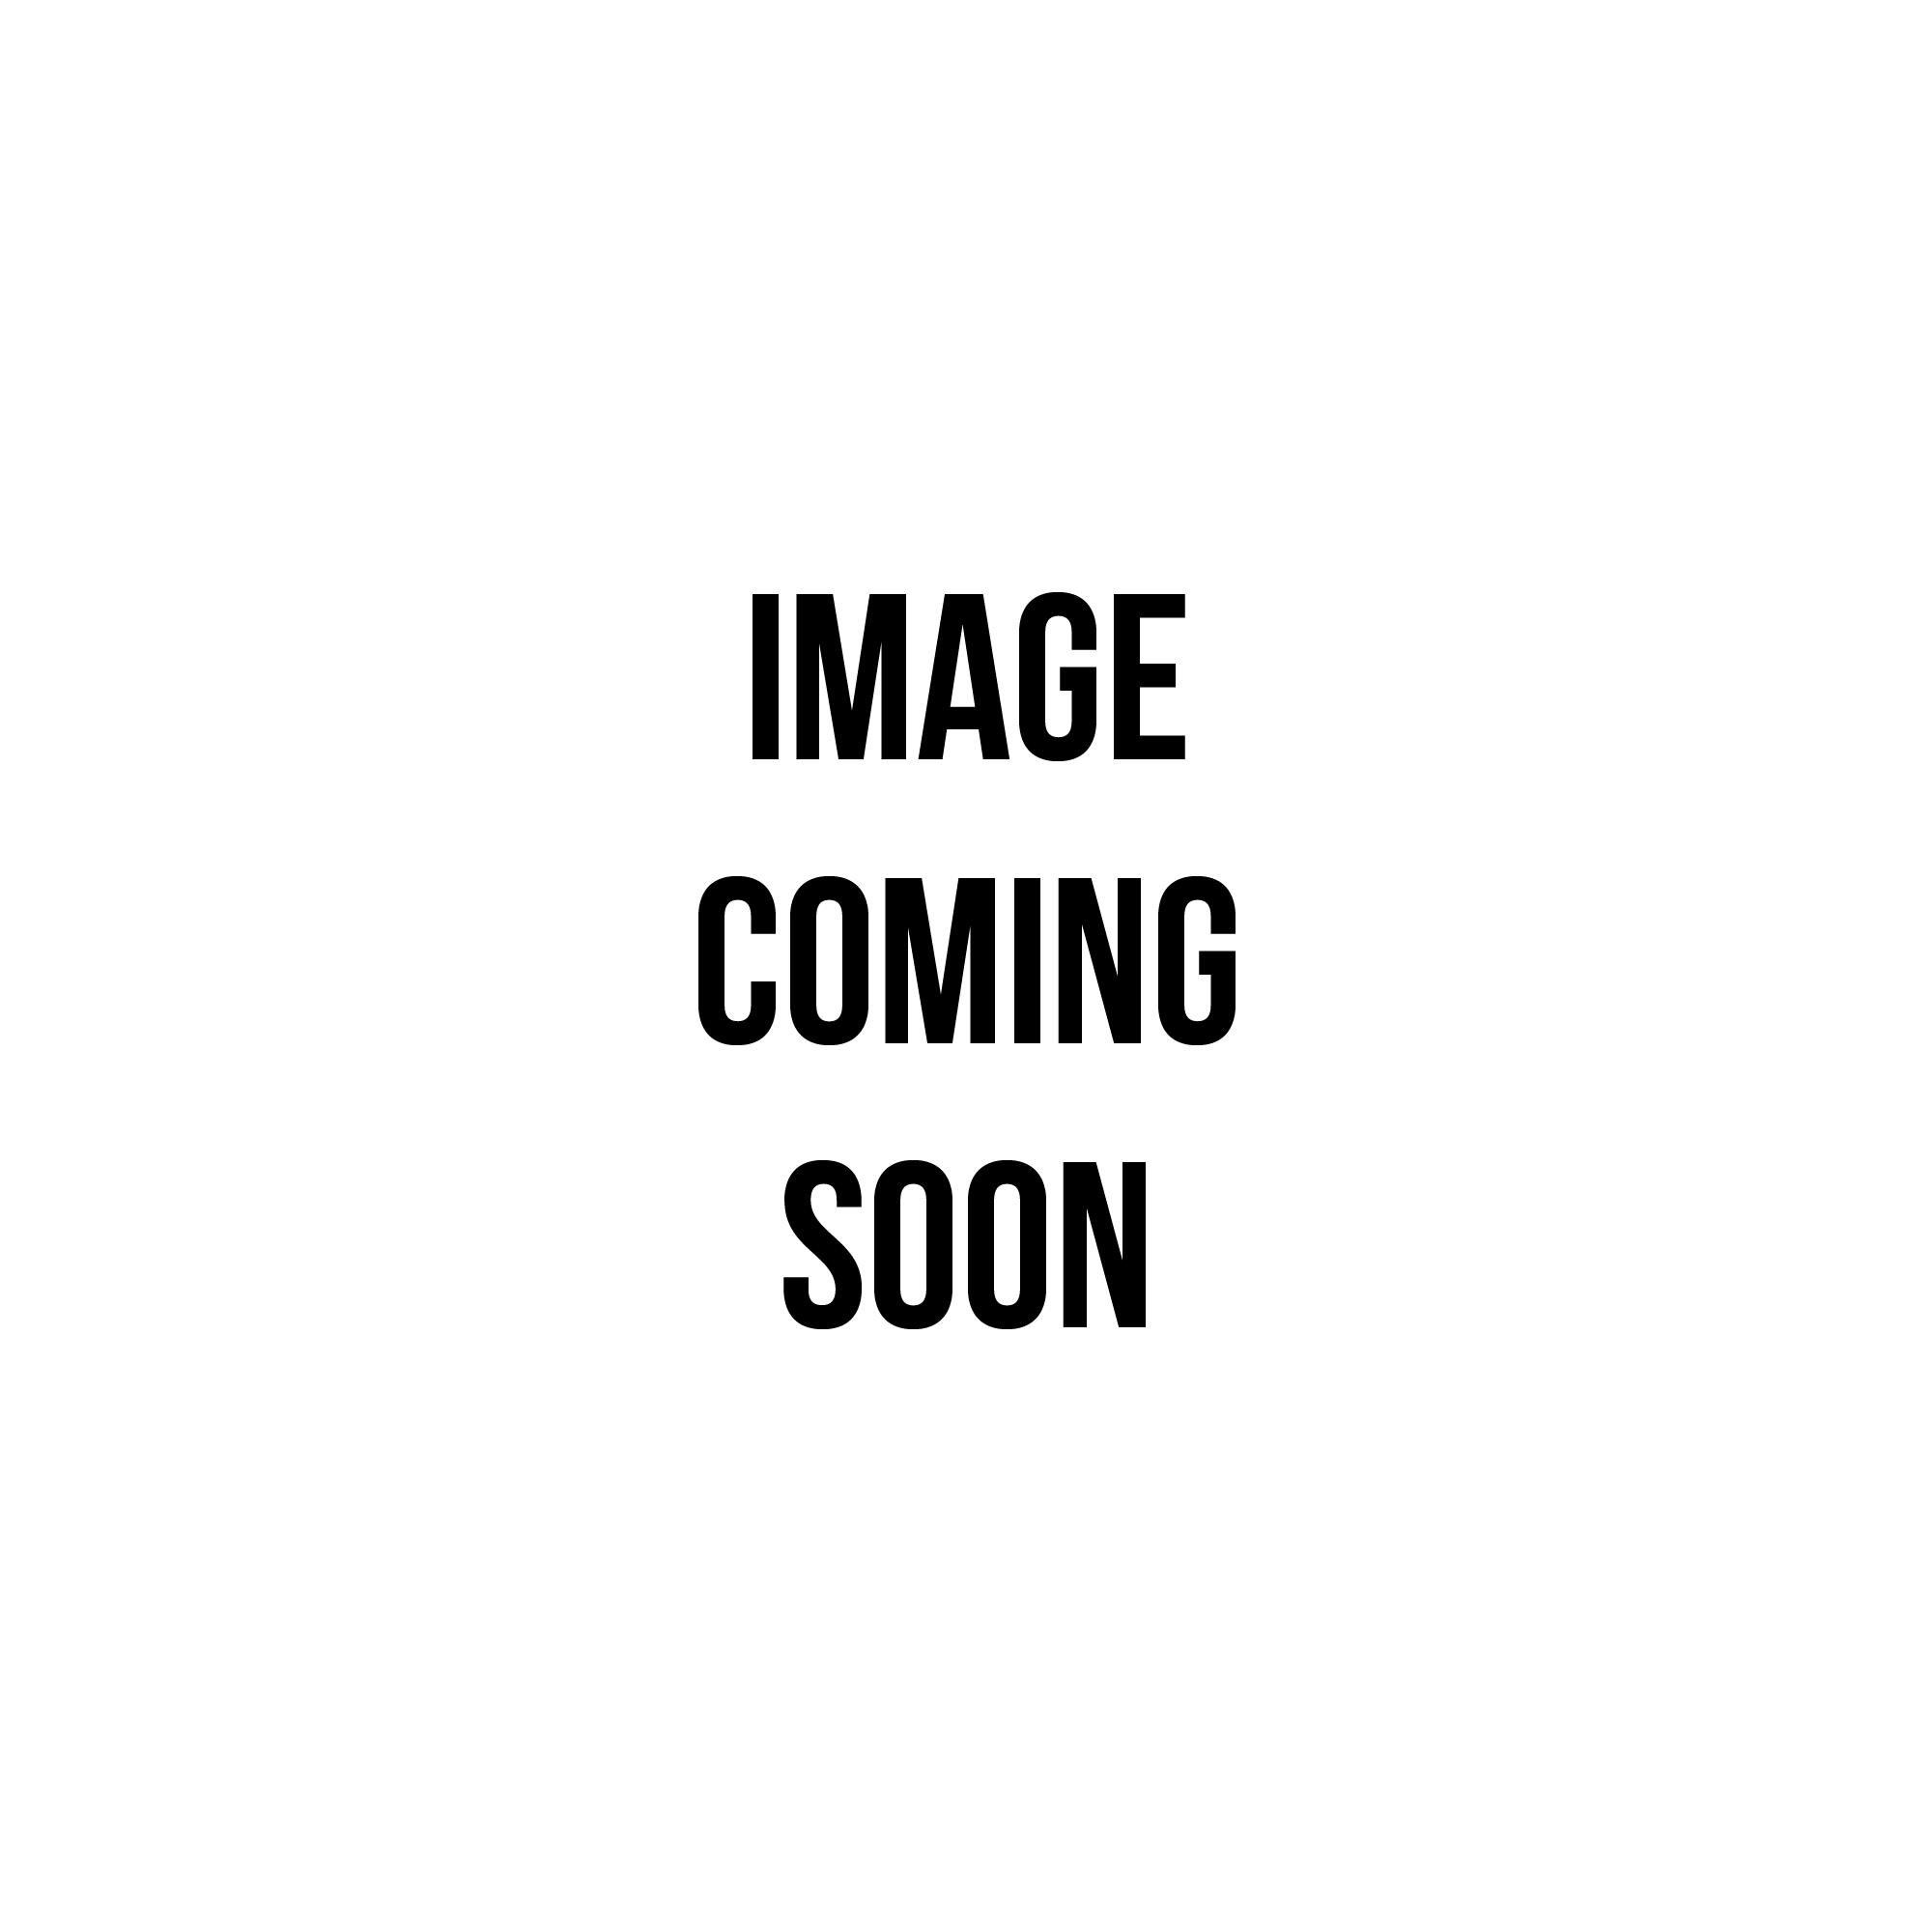 best sneakers 590d6 72dcf Nike Hommes Flyknit Libre 1500 vente ebay pas cher à vendre tumblr tPBaevDn